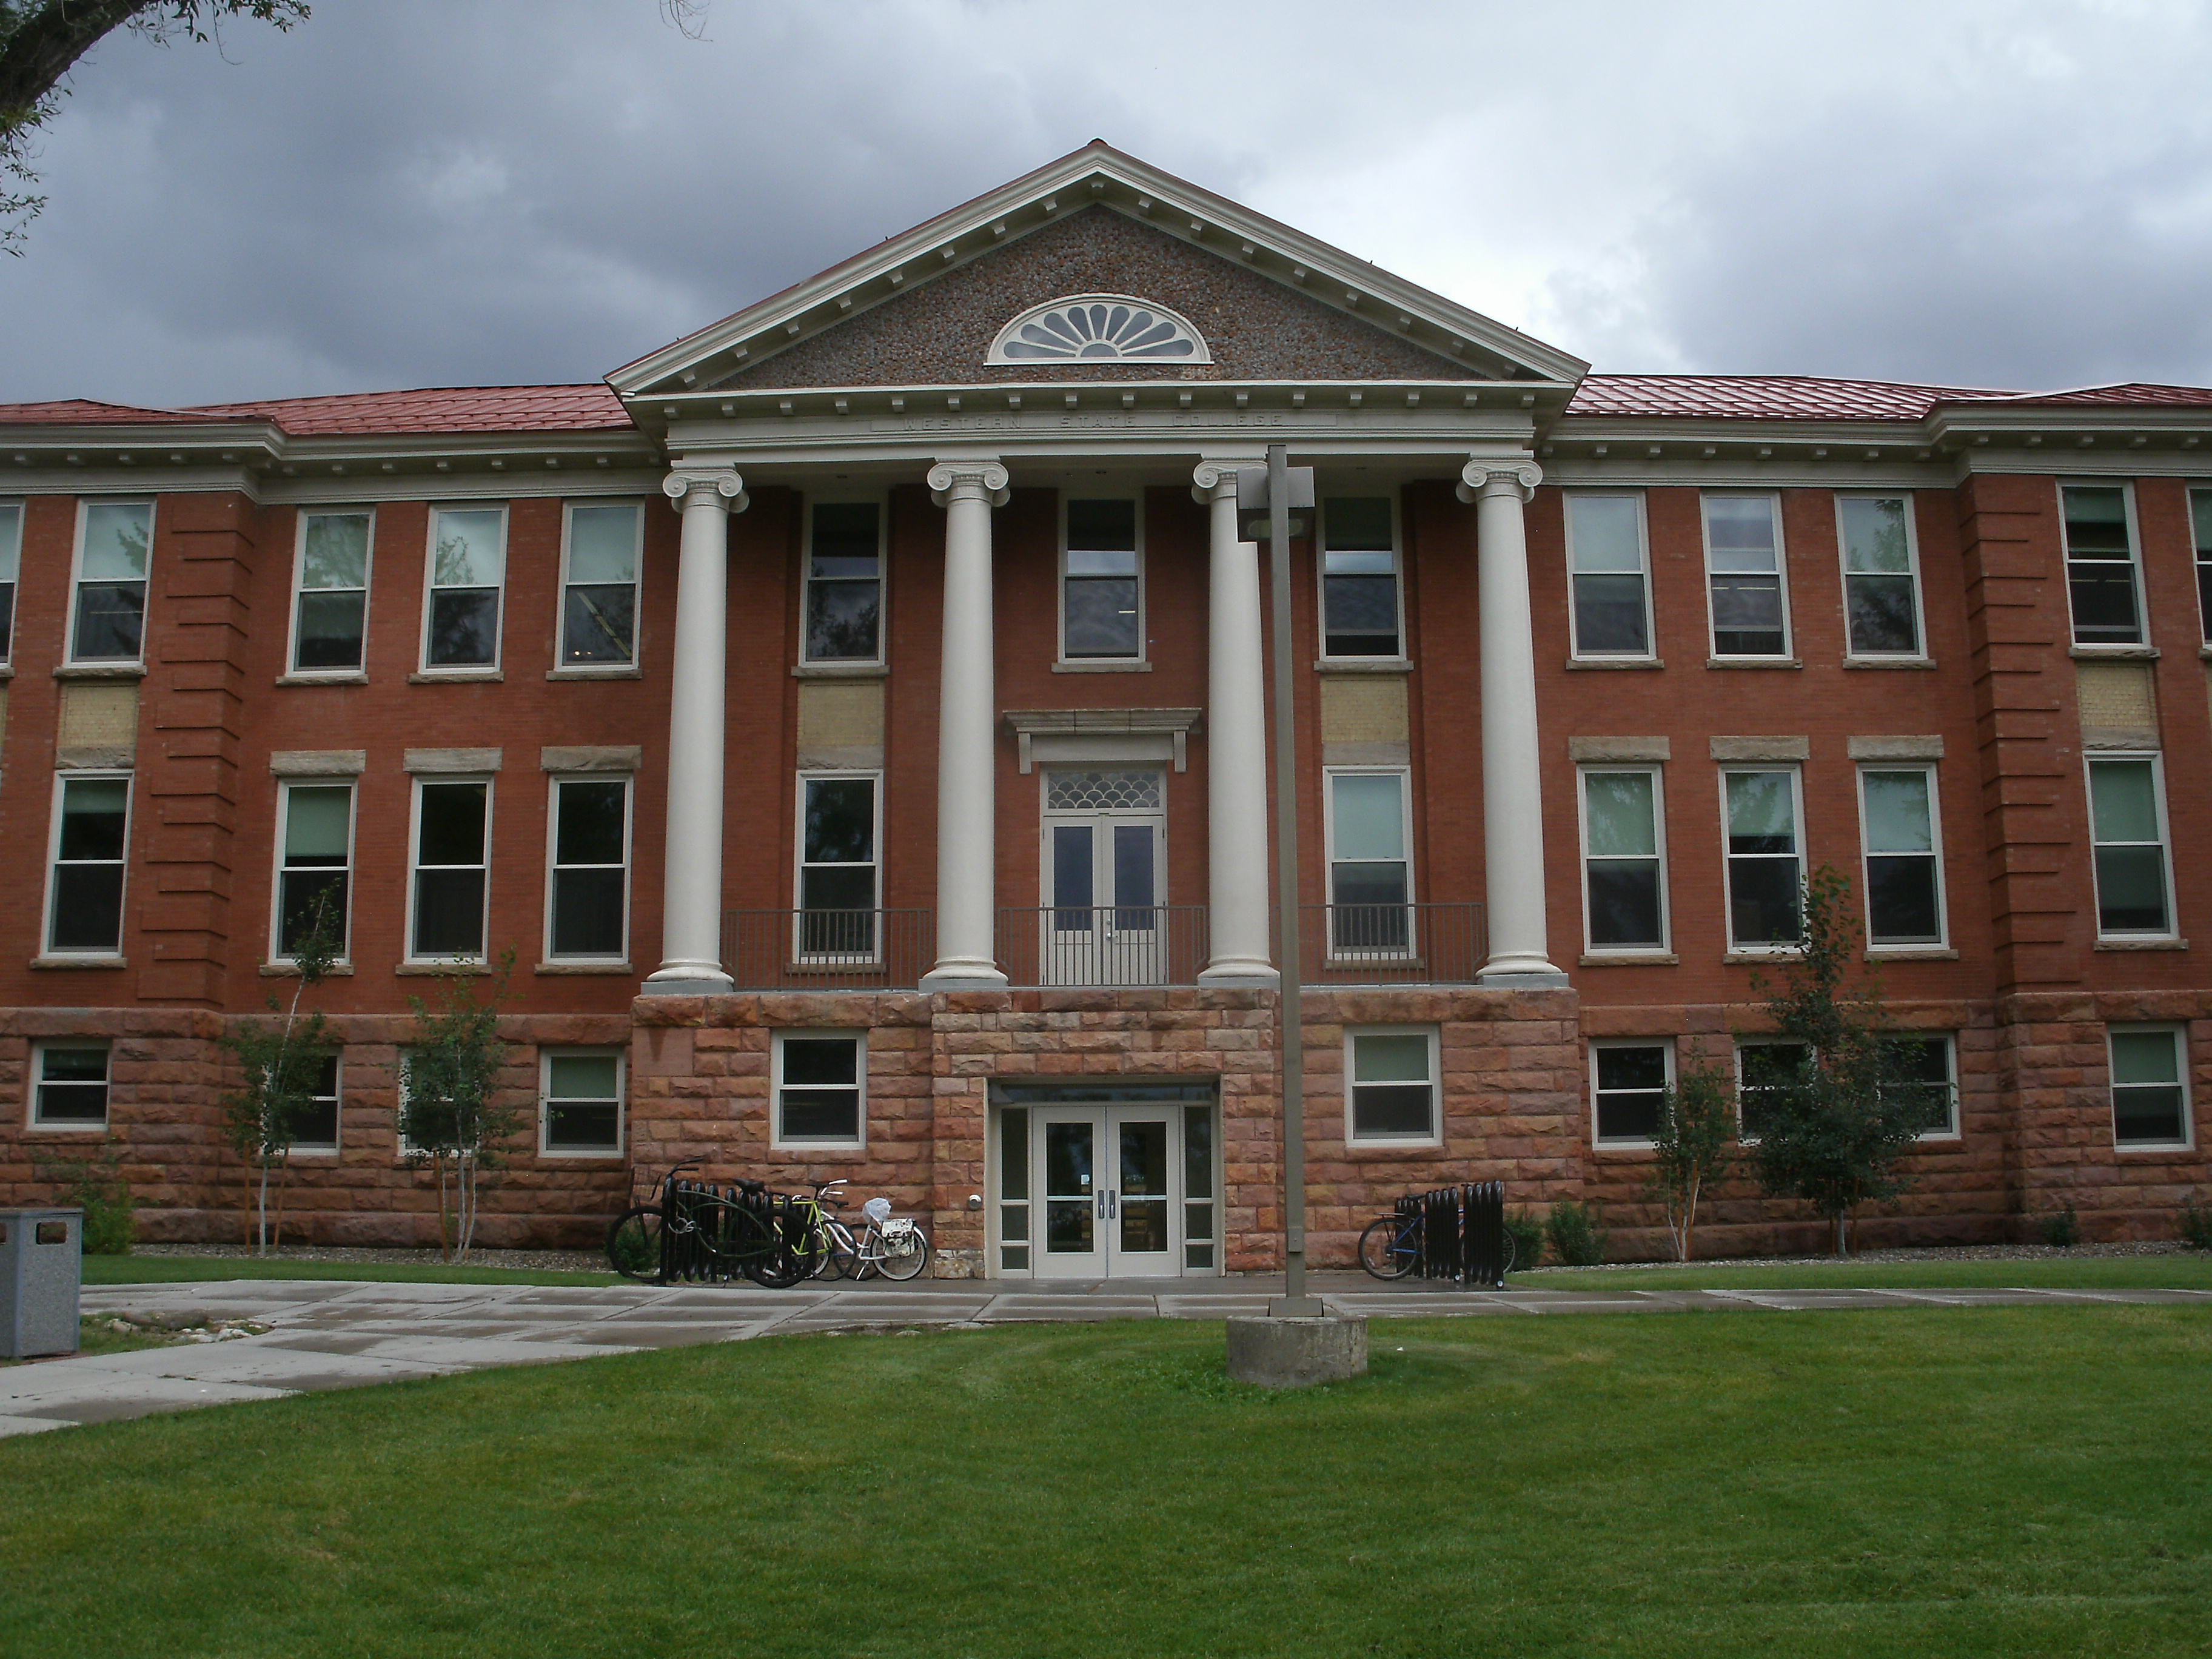 Description state normal school building